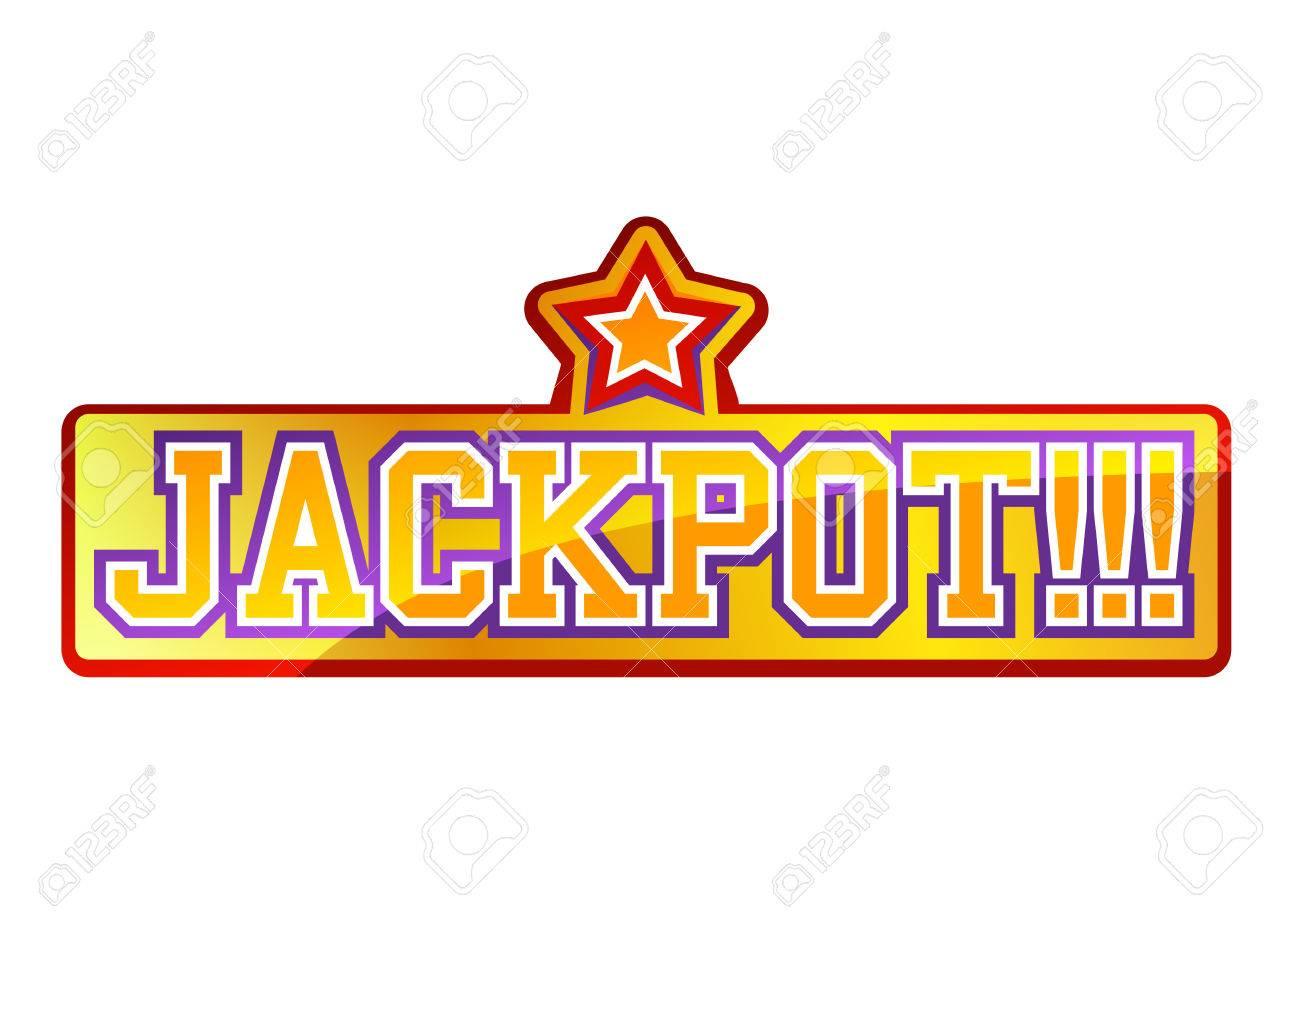 Jackpot Sign - 28417405